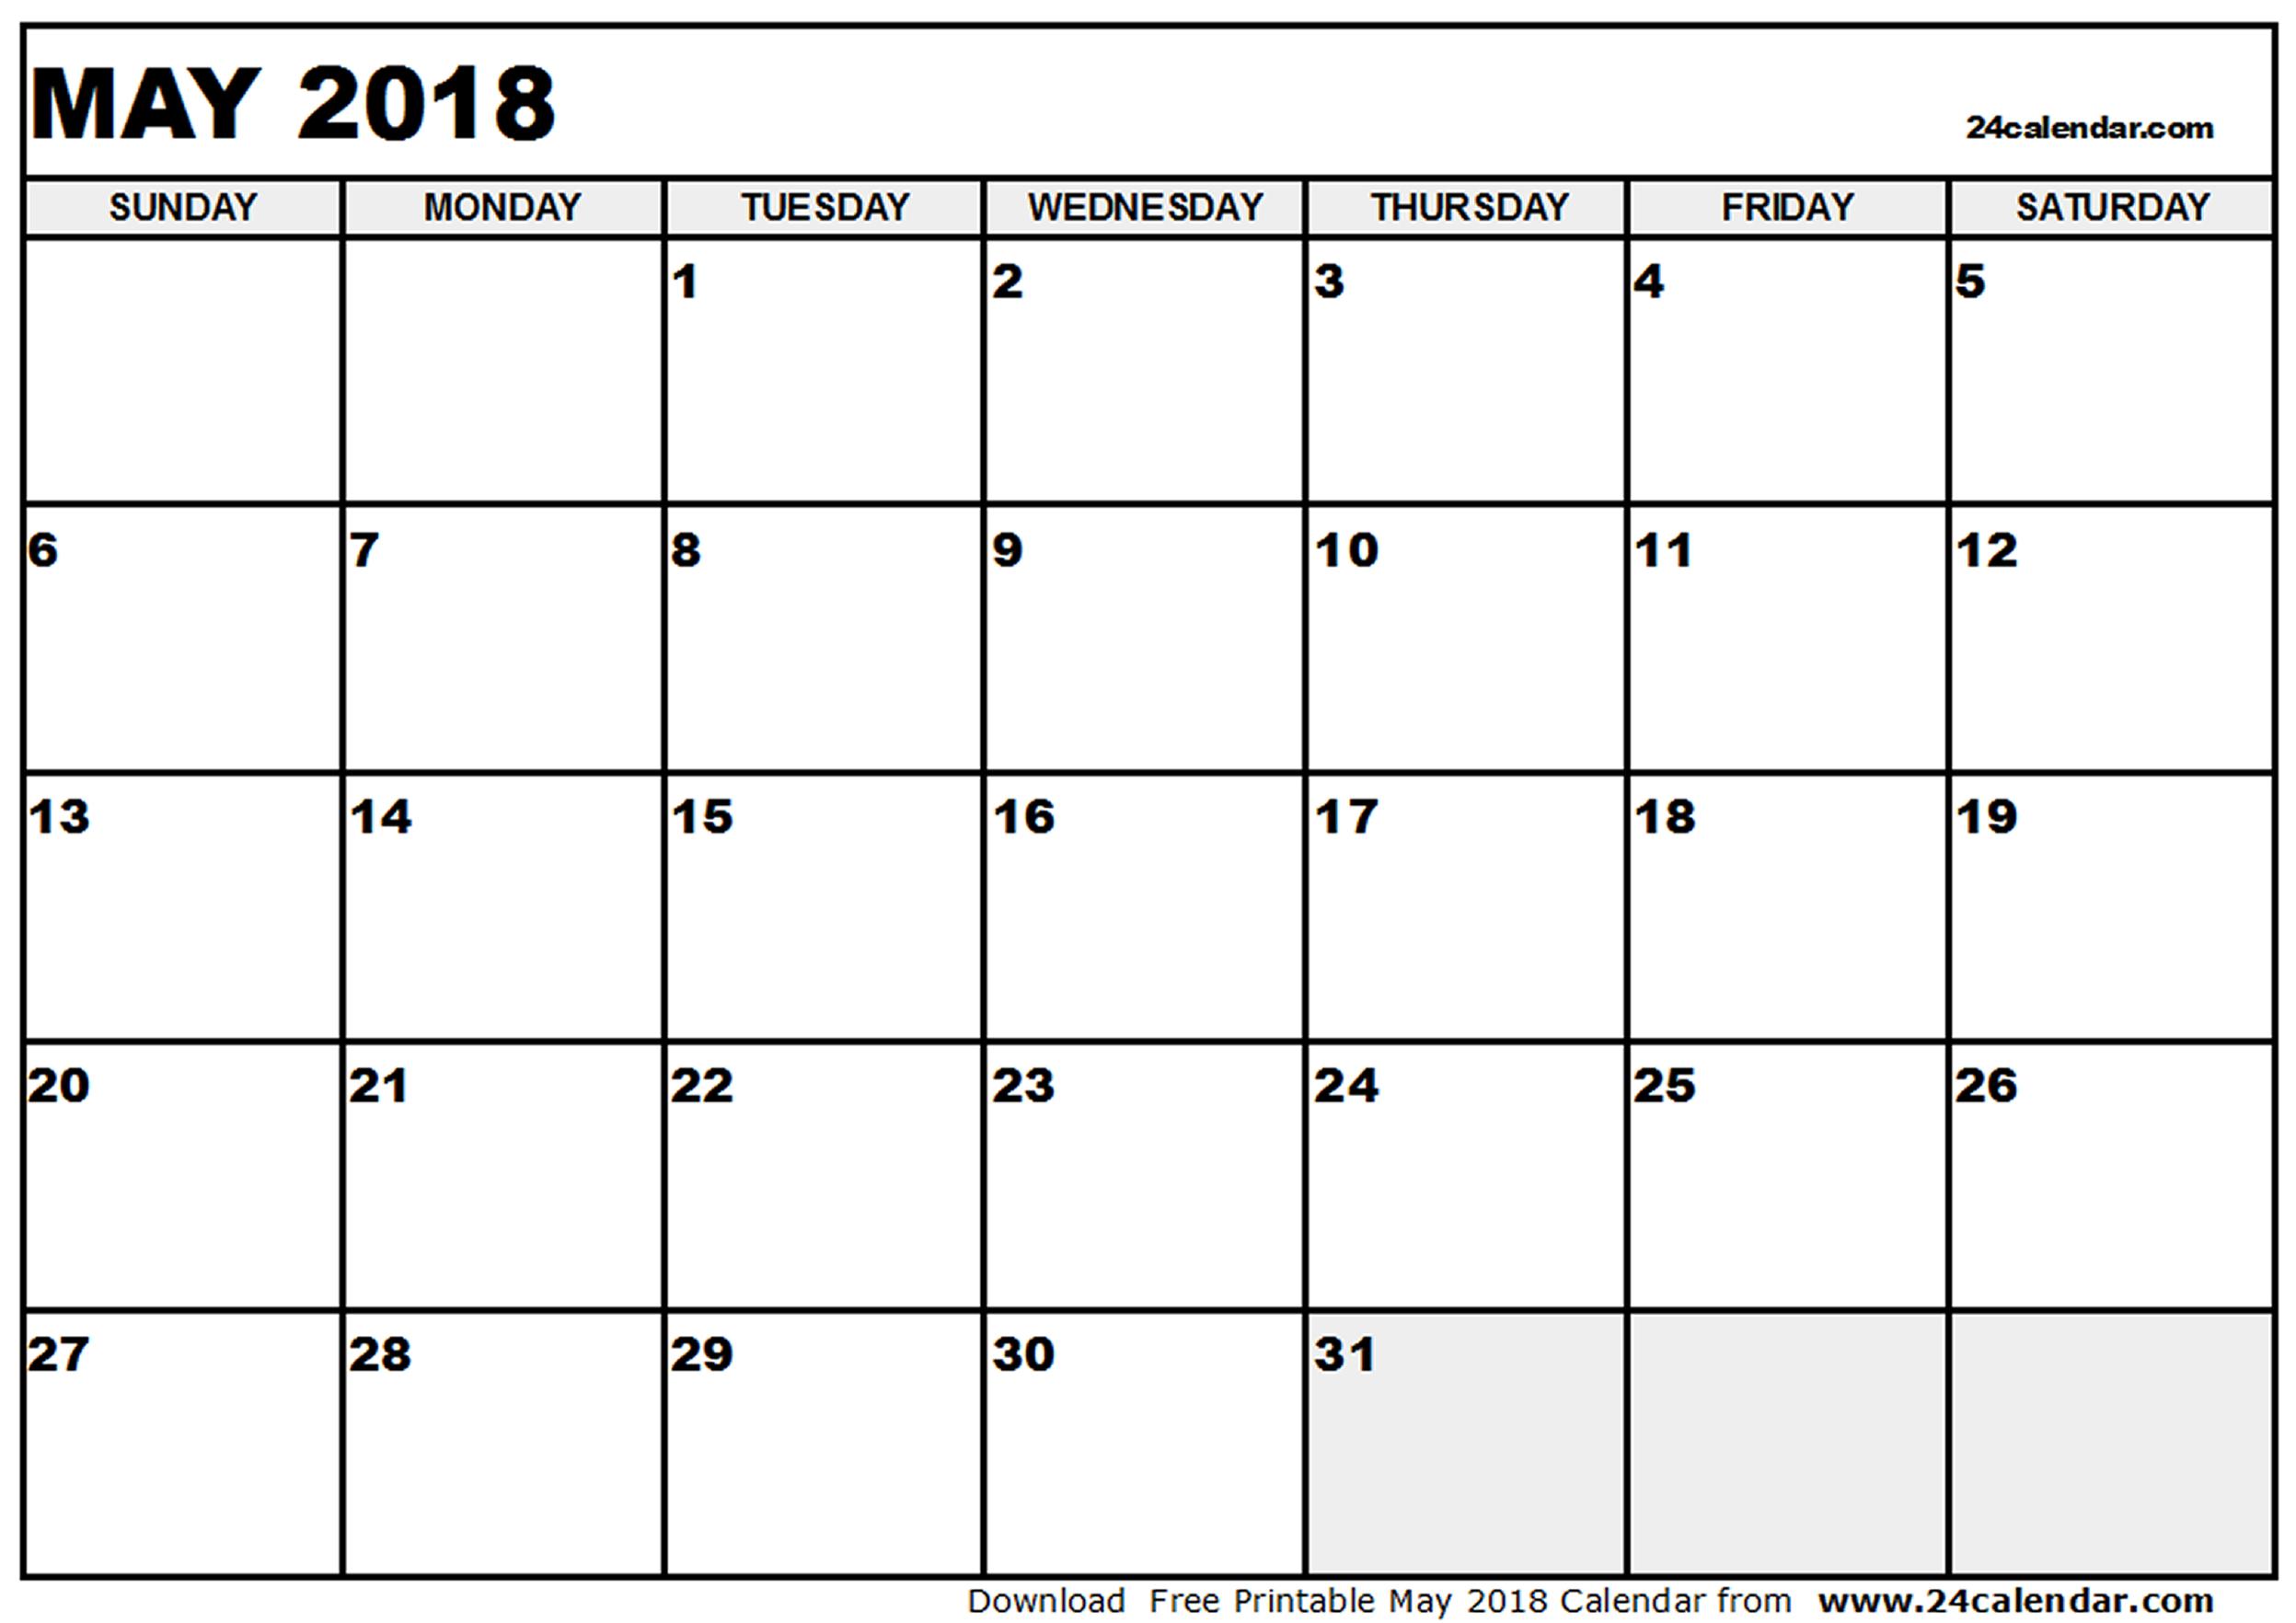 Free May 2018 Printable Calendar Blank Templates In Word